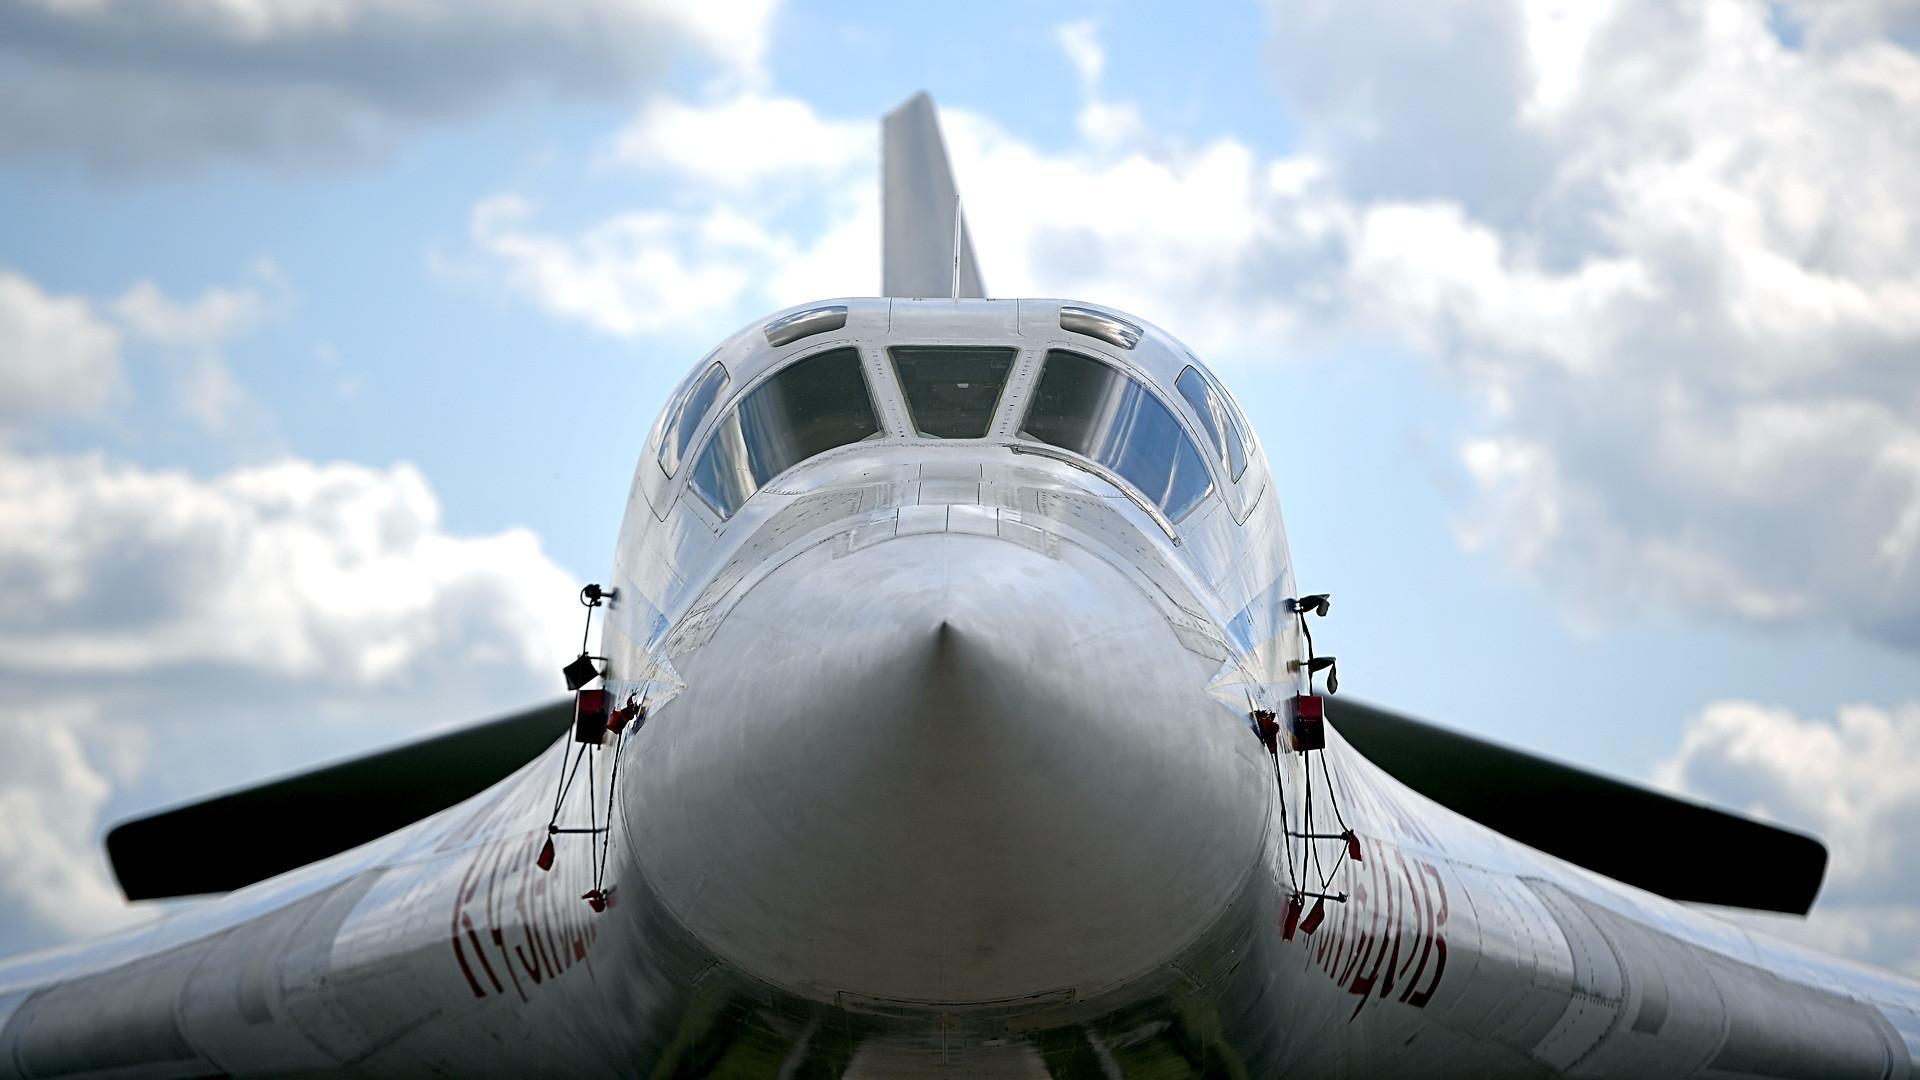 A Tupolev Tu-160 supersonic heavy strategic bomber at the International Aviation and Space Salon MAKS-2017 in Zhukovsky.